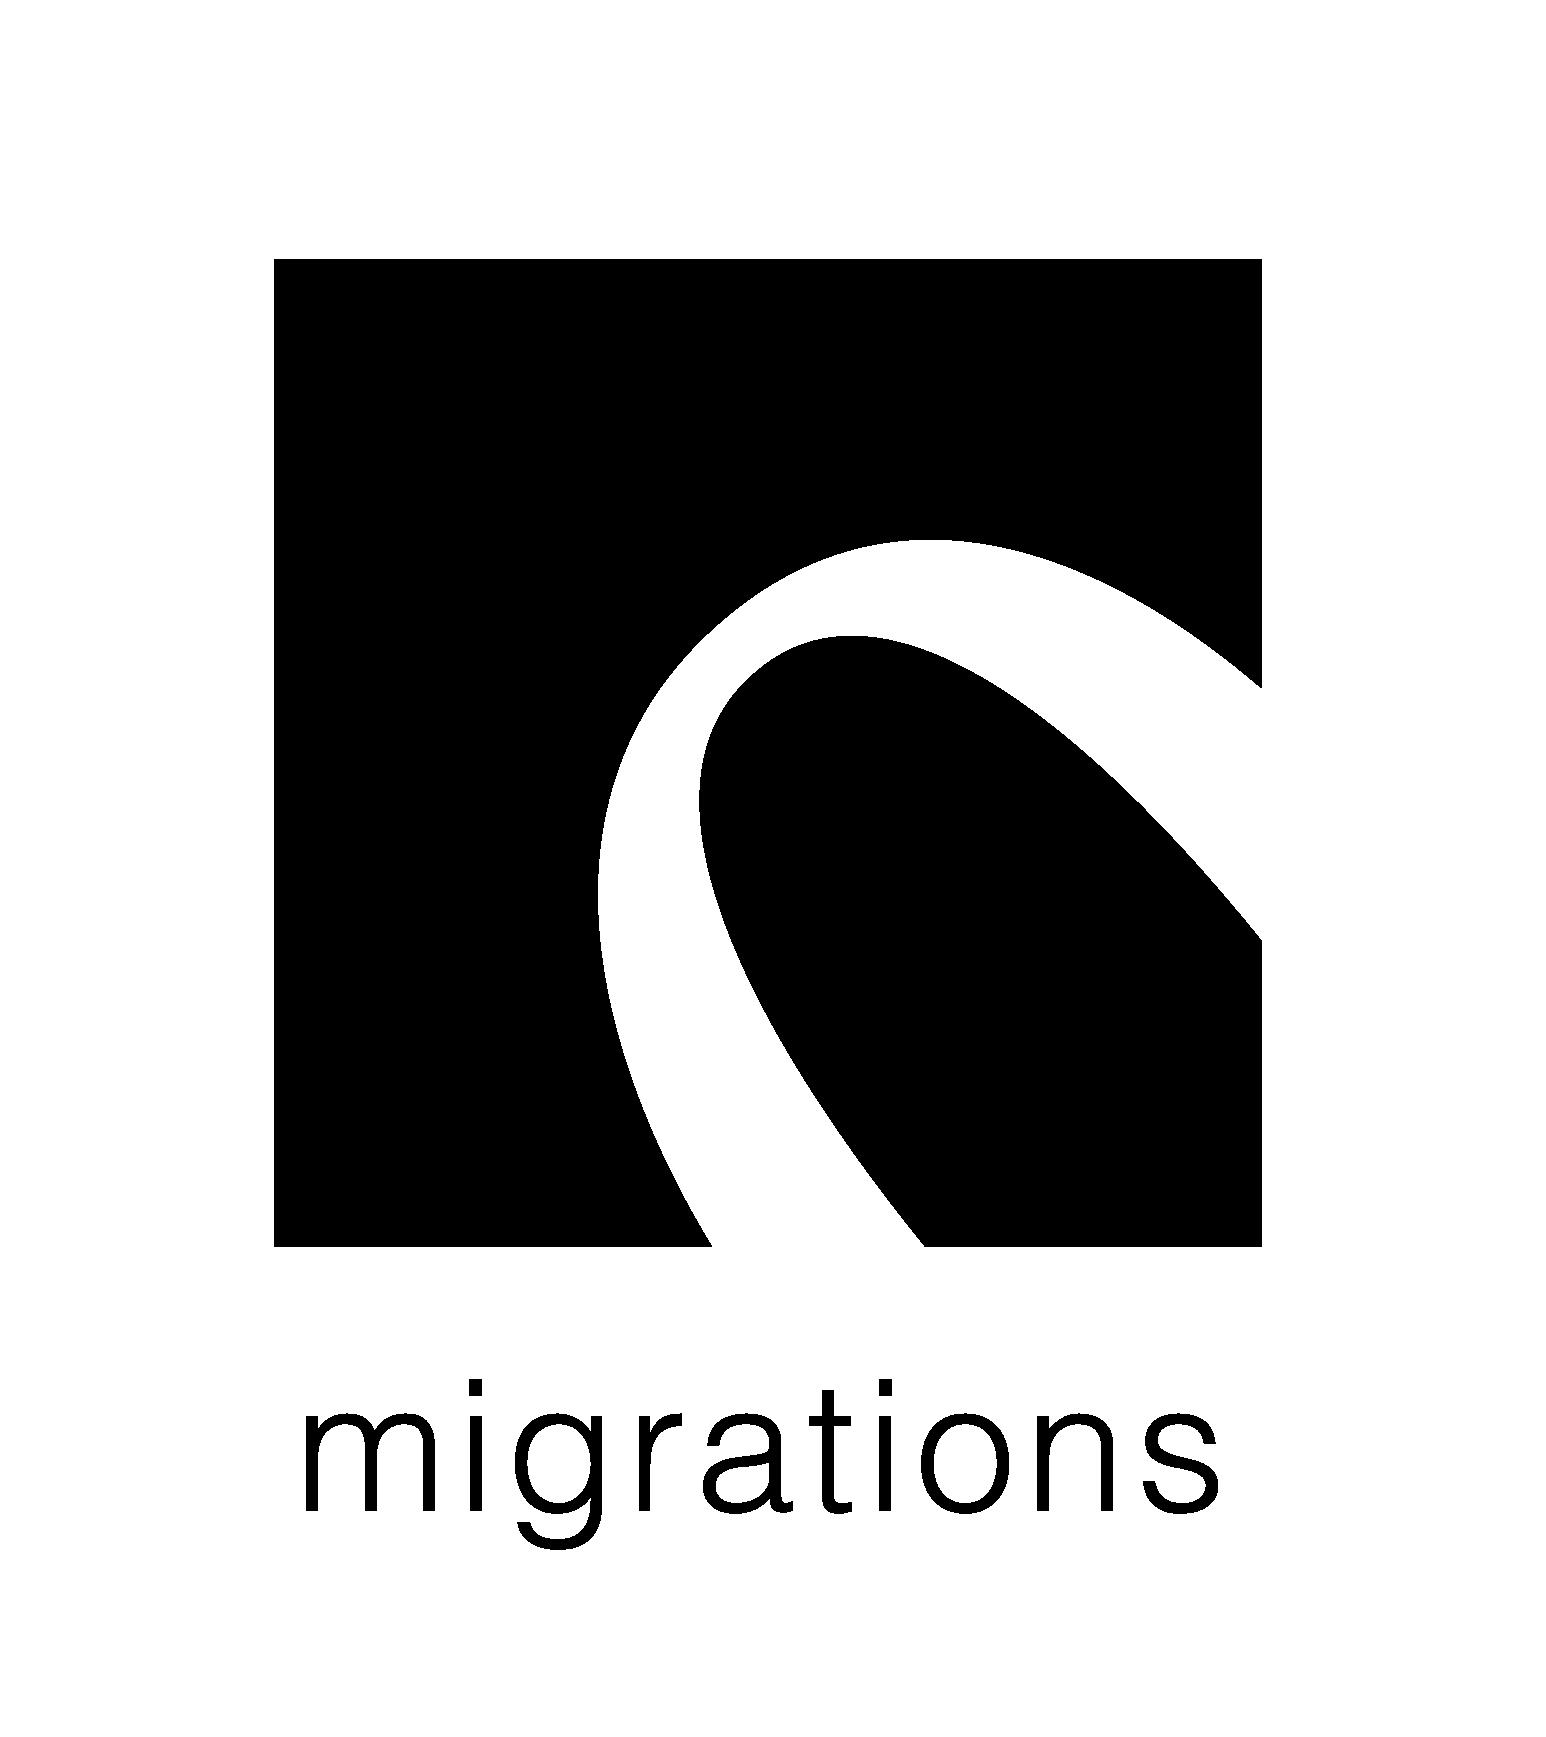 Migrations Logo